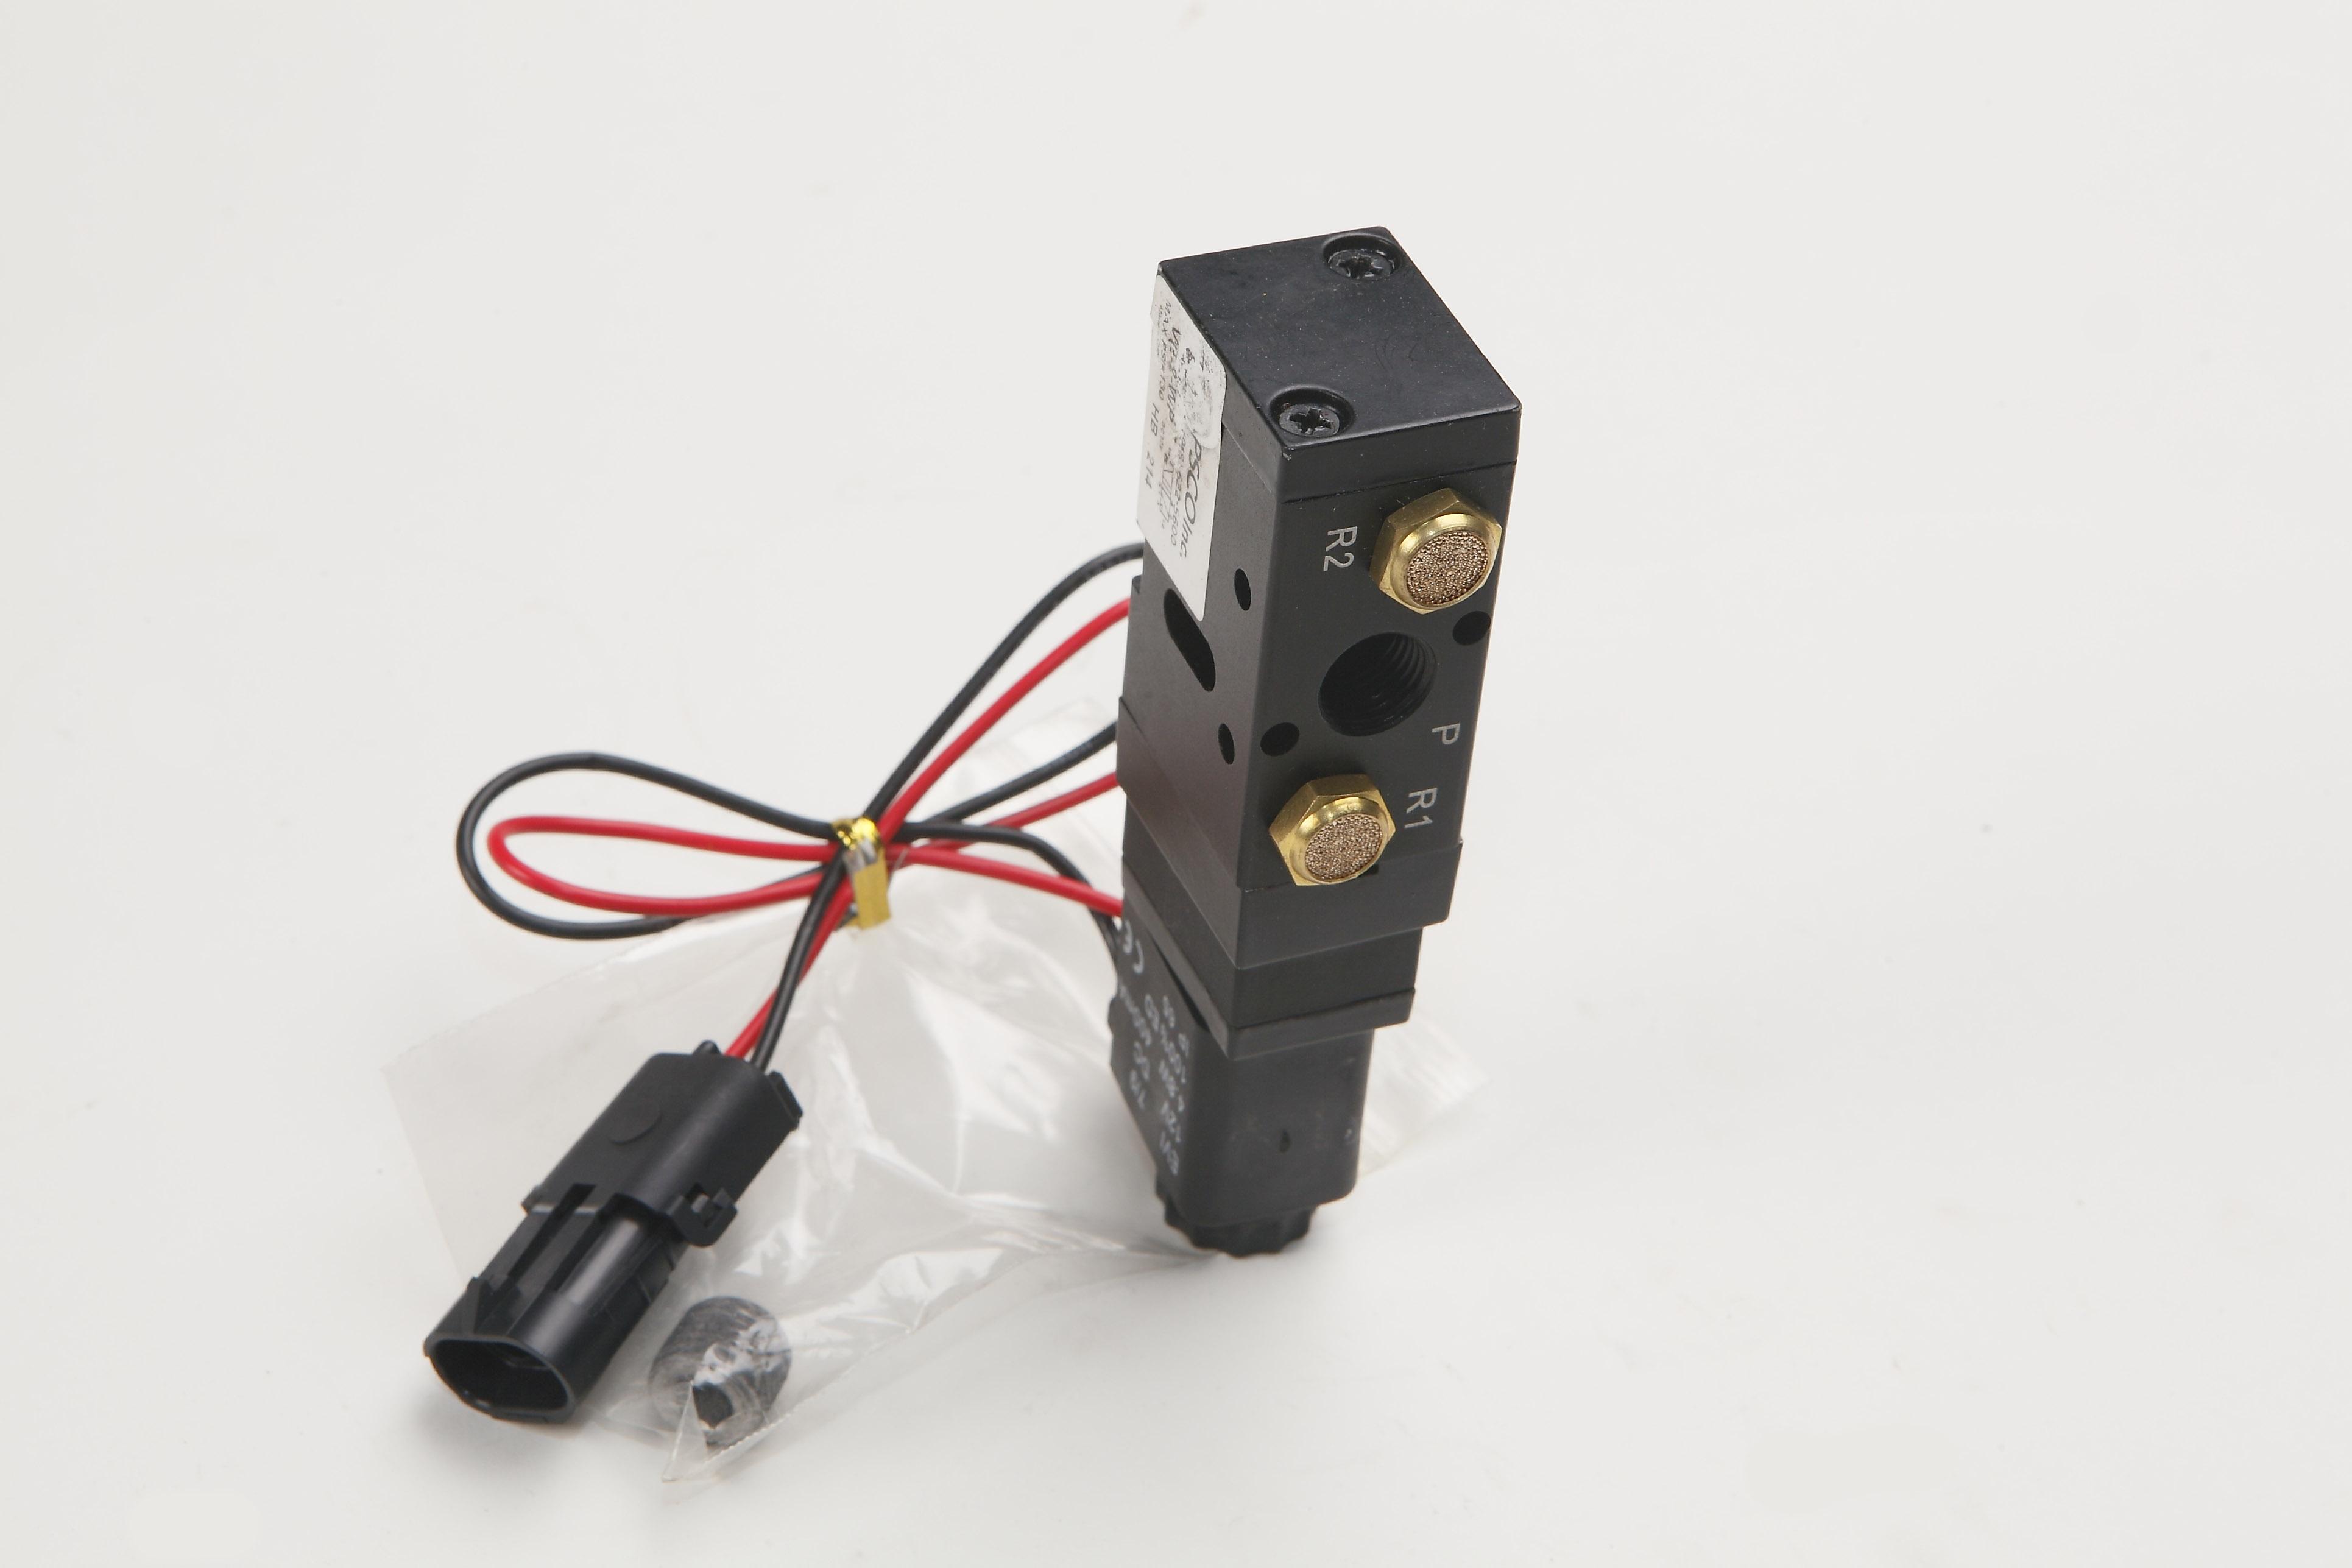 Ox Body Tarp Wiring Diagram Archive Of Automotive Switch Images Gallery Pneumatics Parts Rh Bodies Tbeidumpbodyparts Com